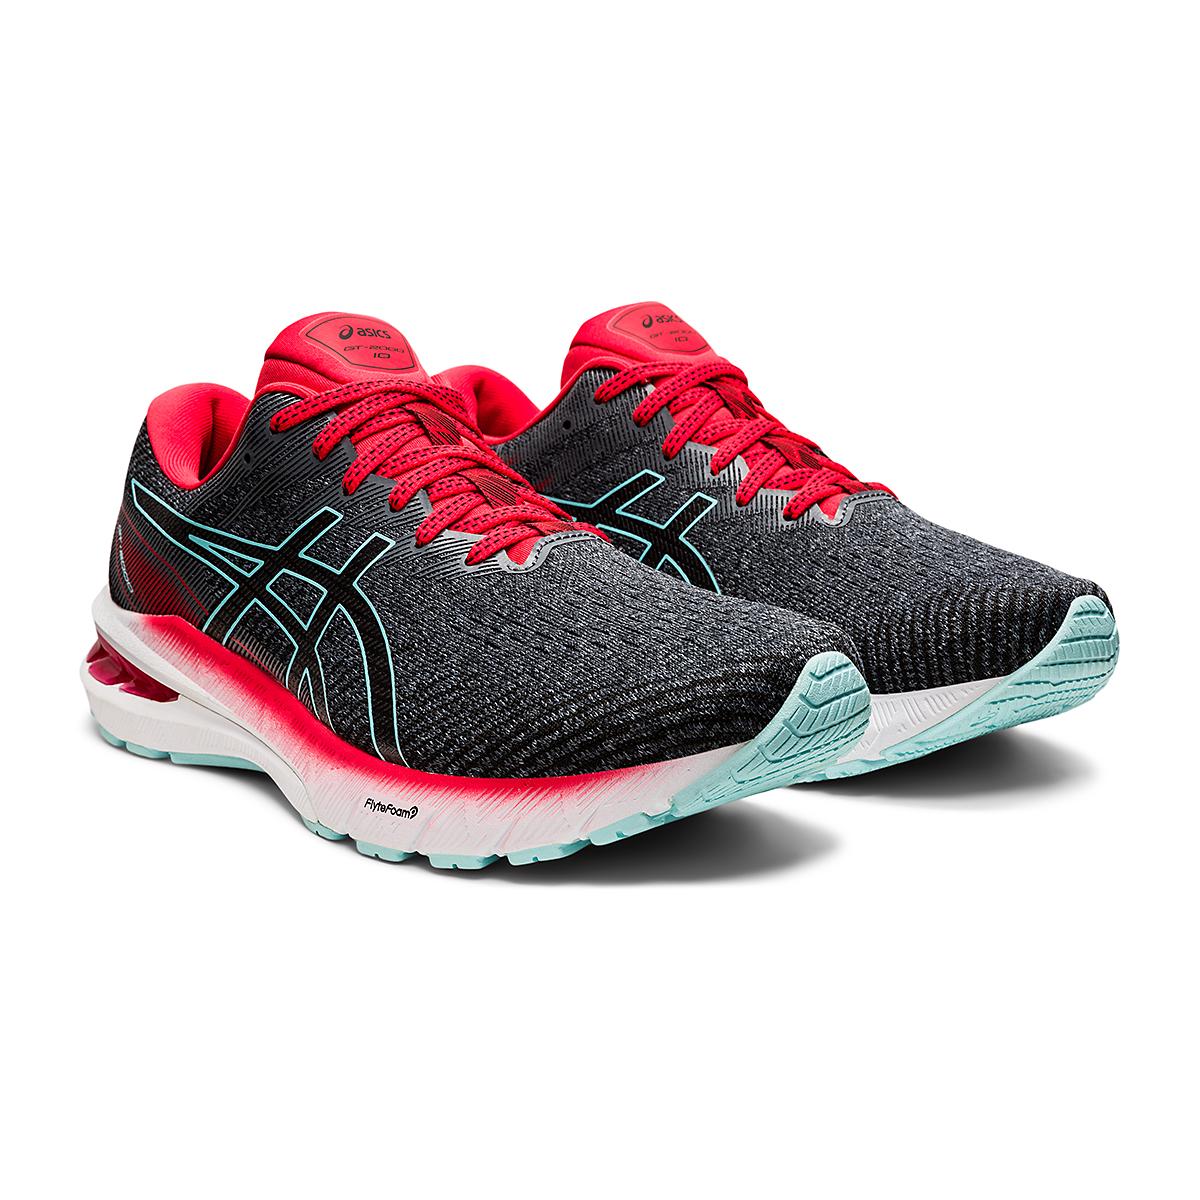 Men's Asics GT-2000 10 Running Shoe - Color: Metropolis/Electric Red - Size: 7 - Width: Regular, Metropolis/Electric Red, large, image 3